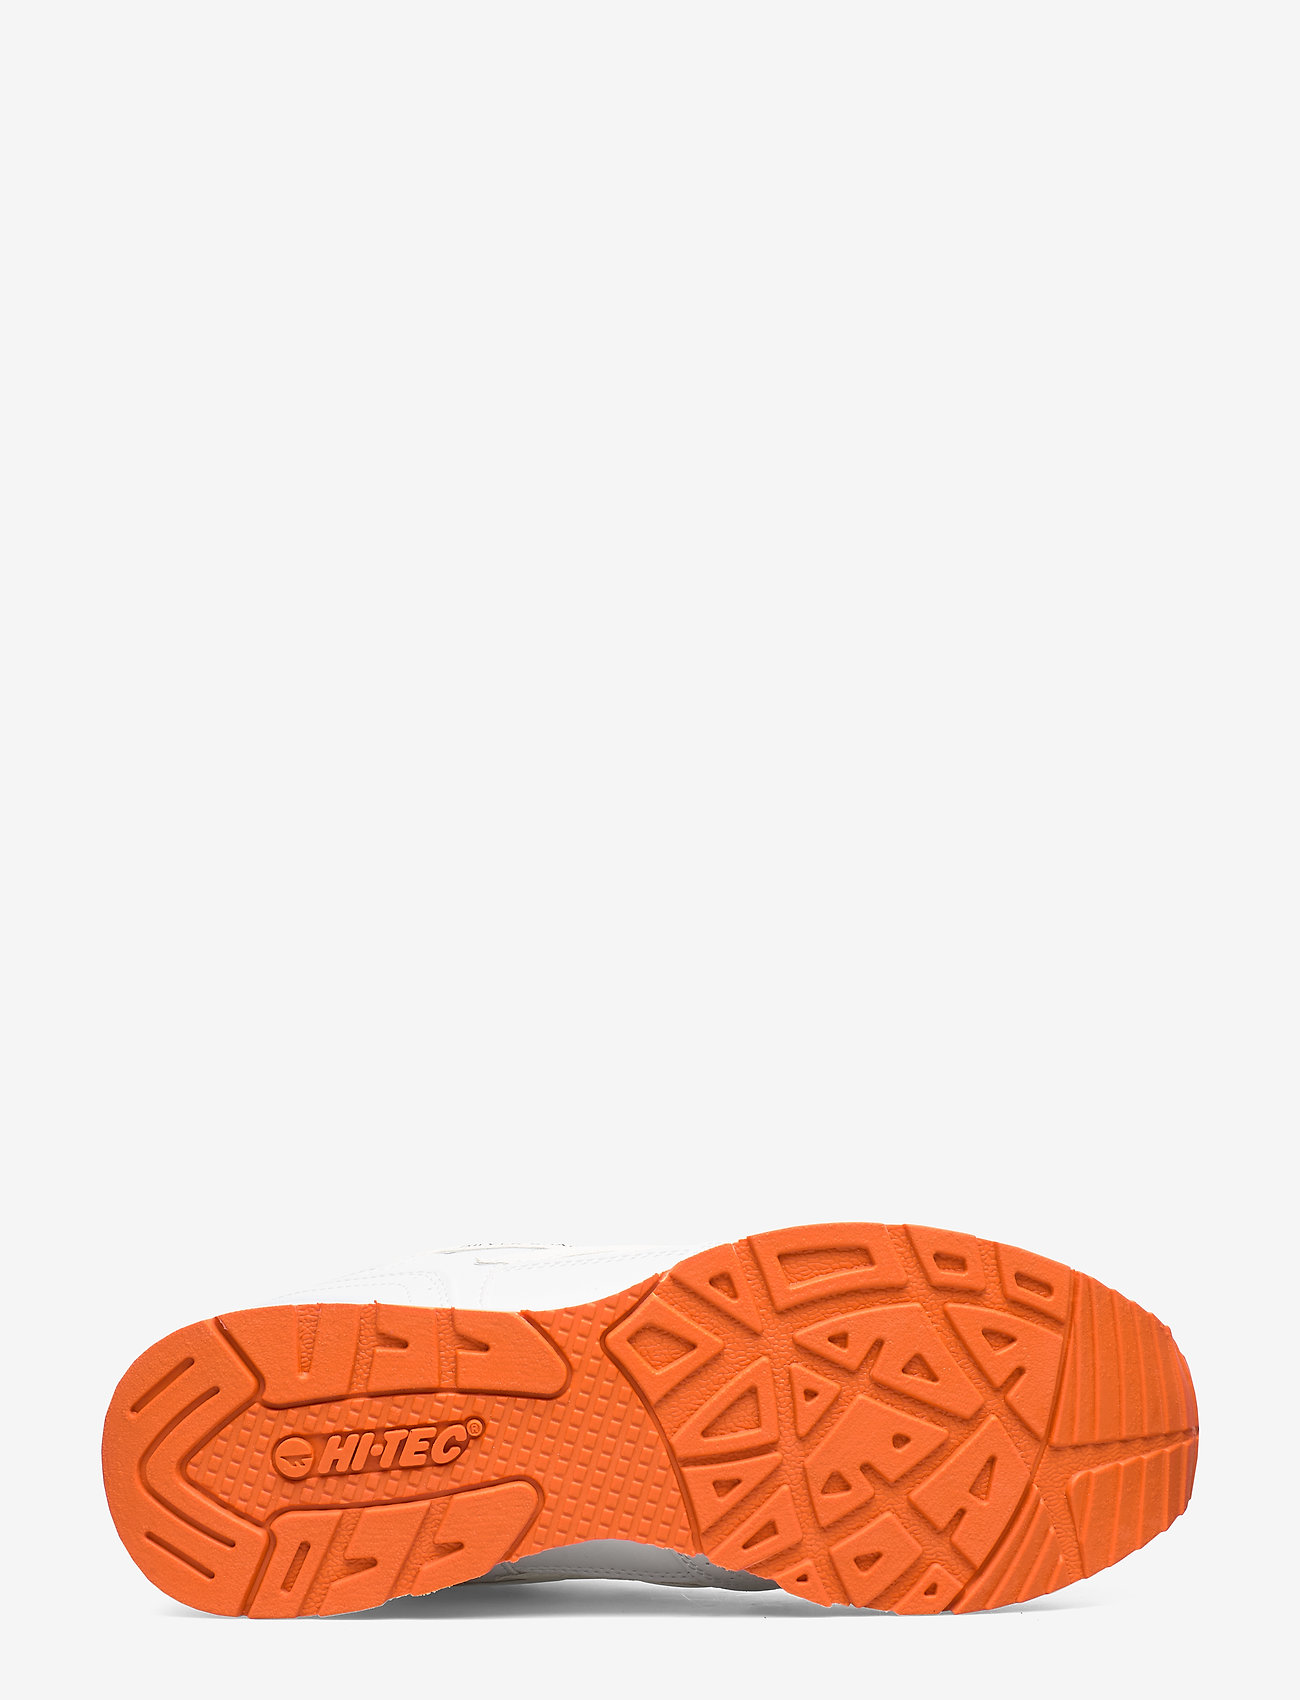 Hi-tec Ht Silver Shadow White/black/red Orange - Sneakers Orng